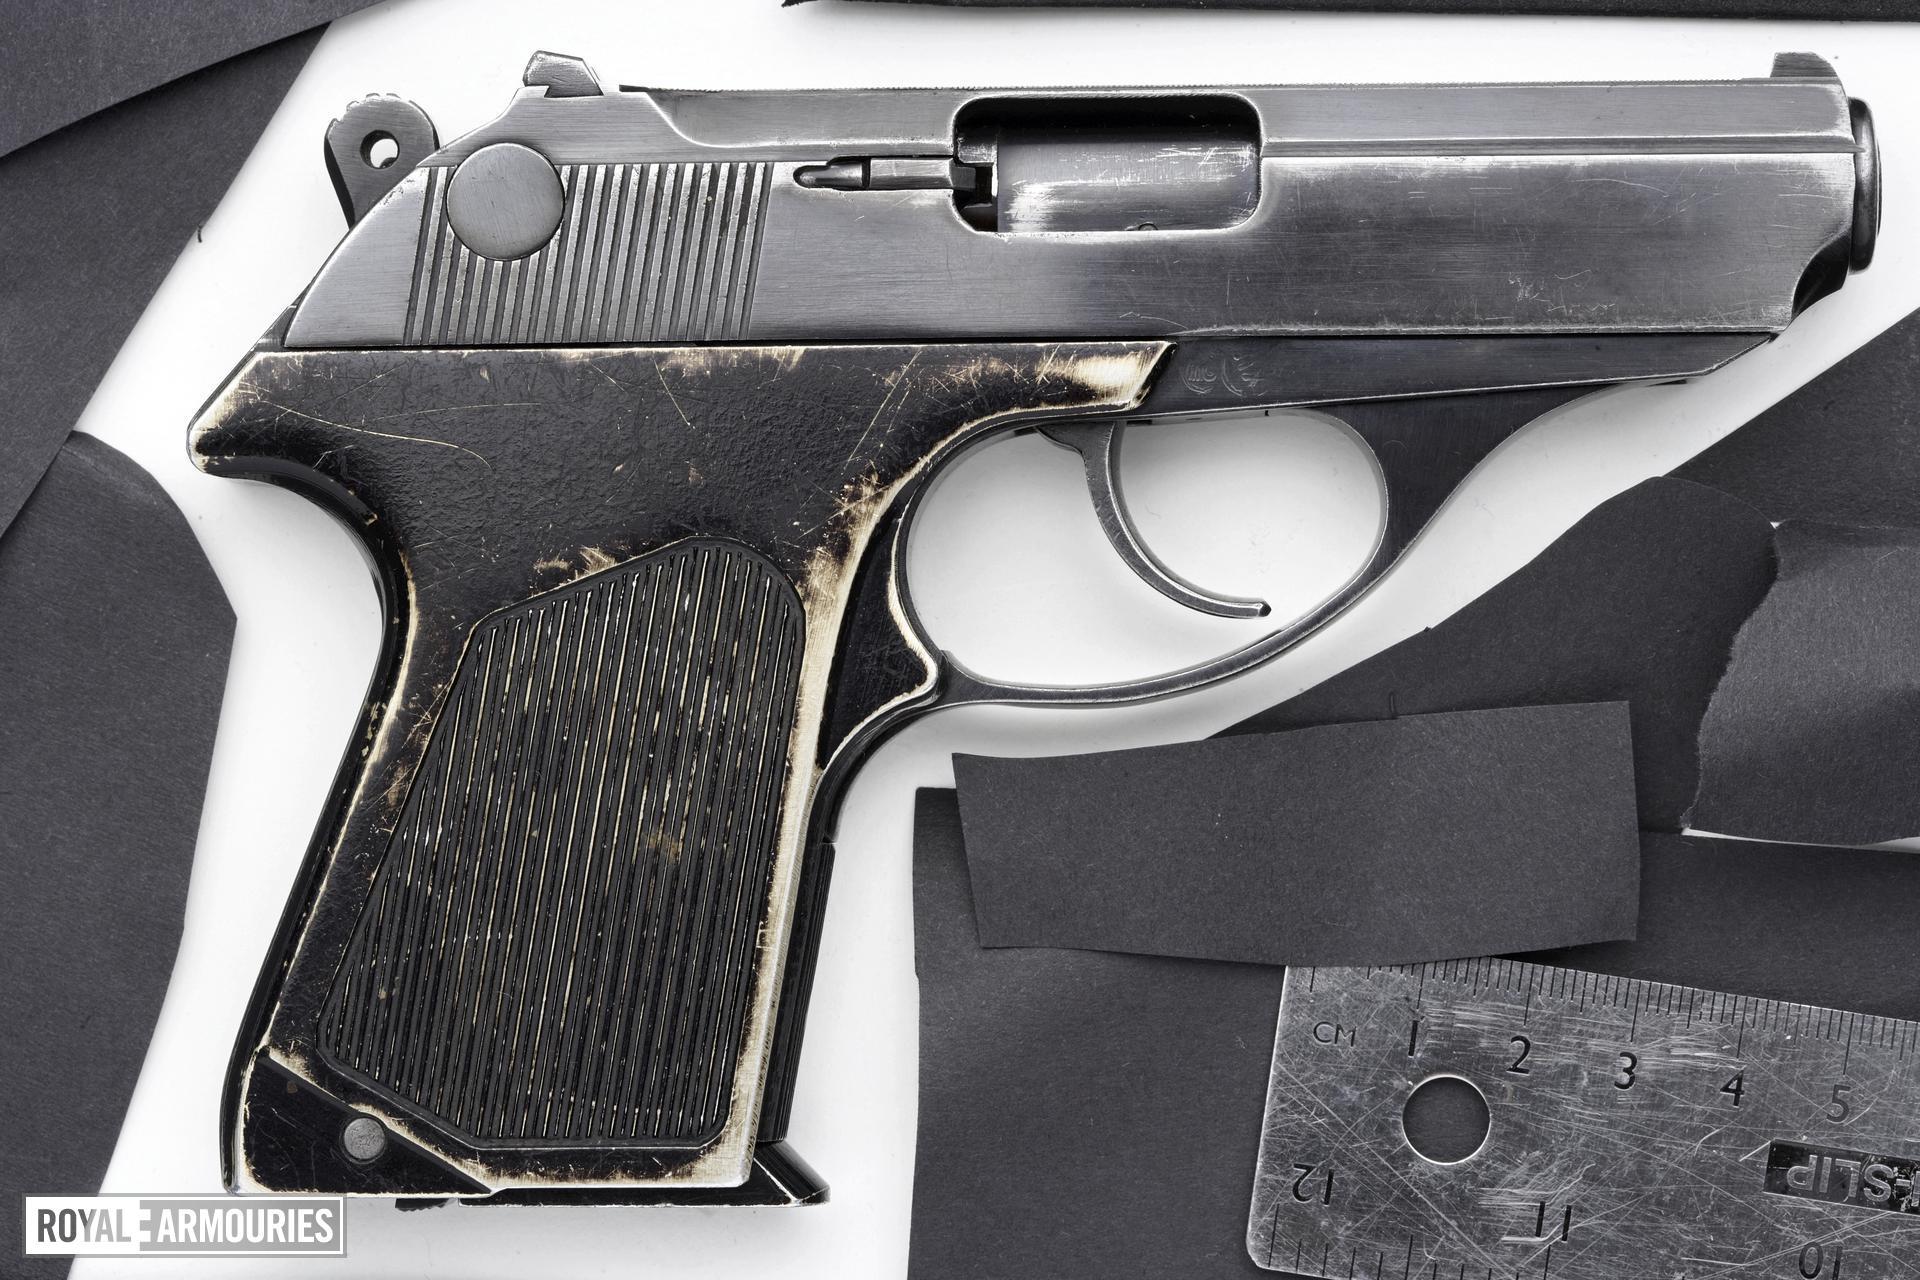 Centrefire self-loading pistol - PSM